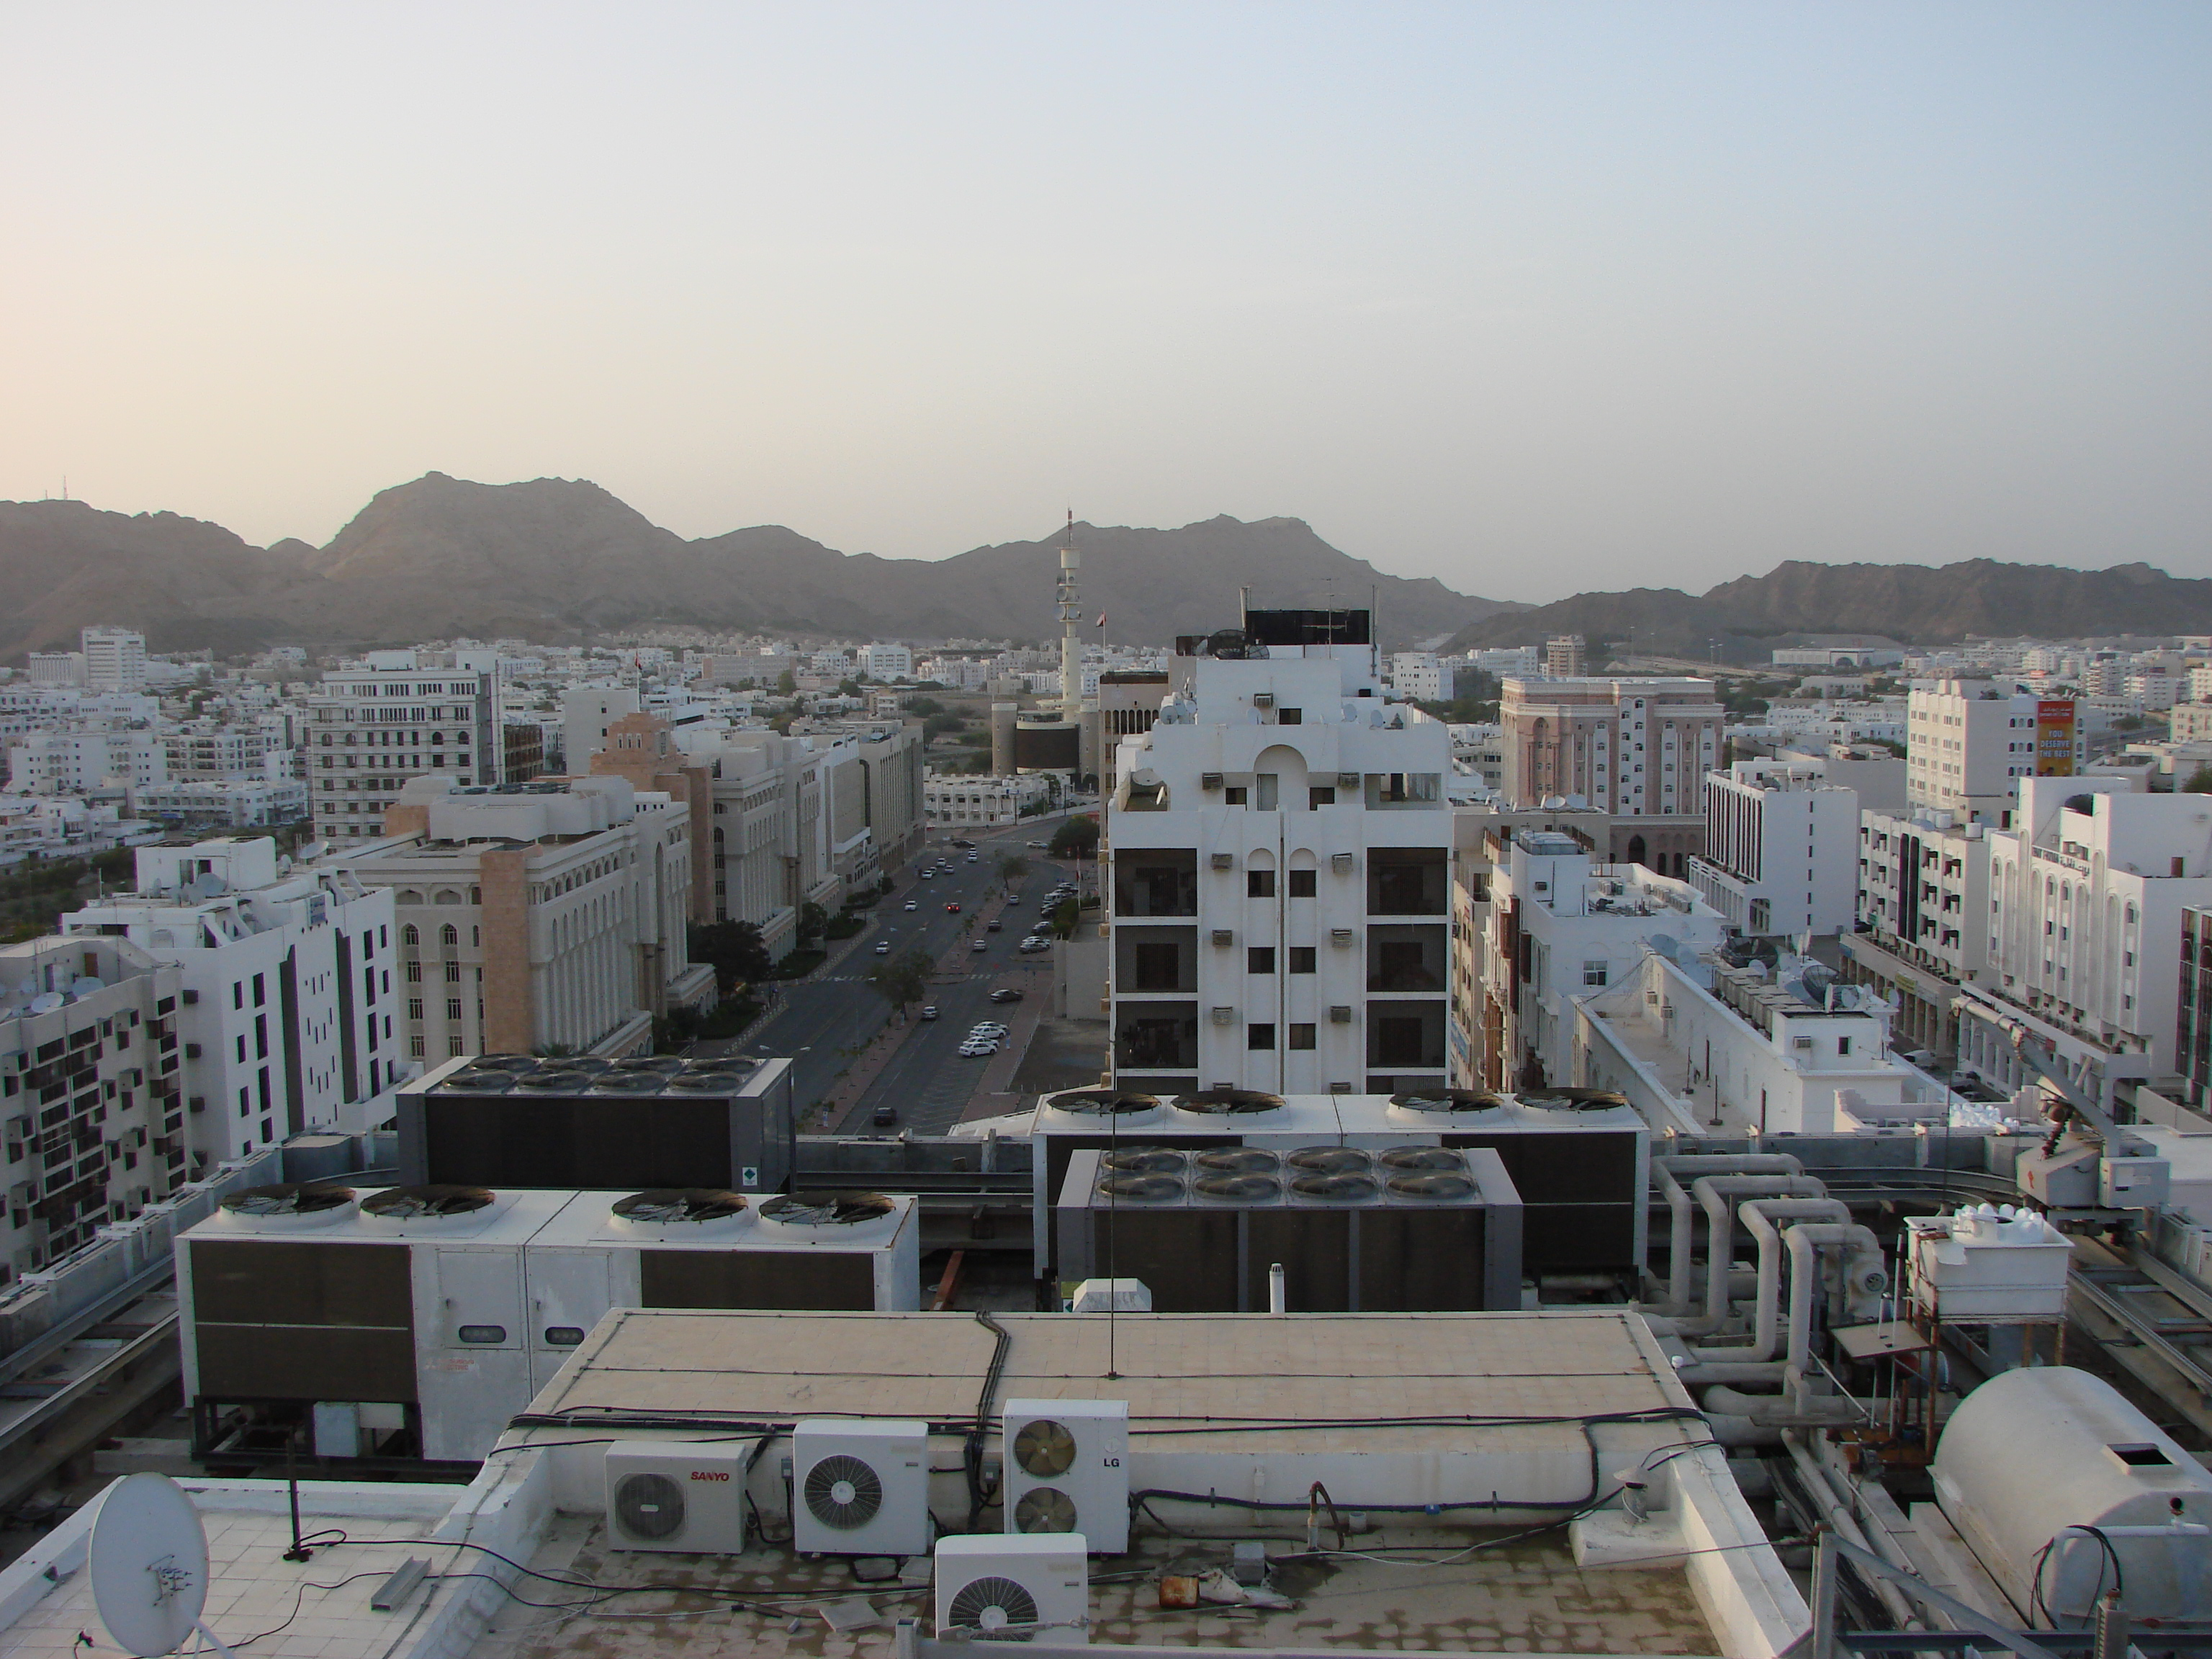 Decline in real estate deals in Oman